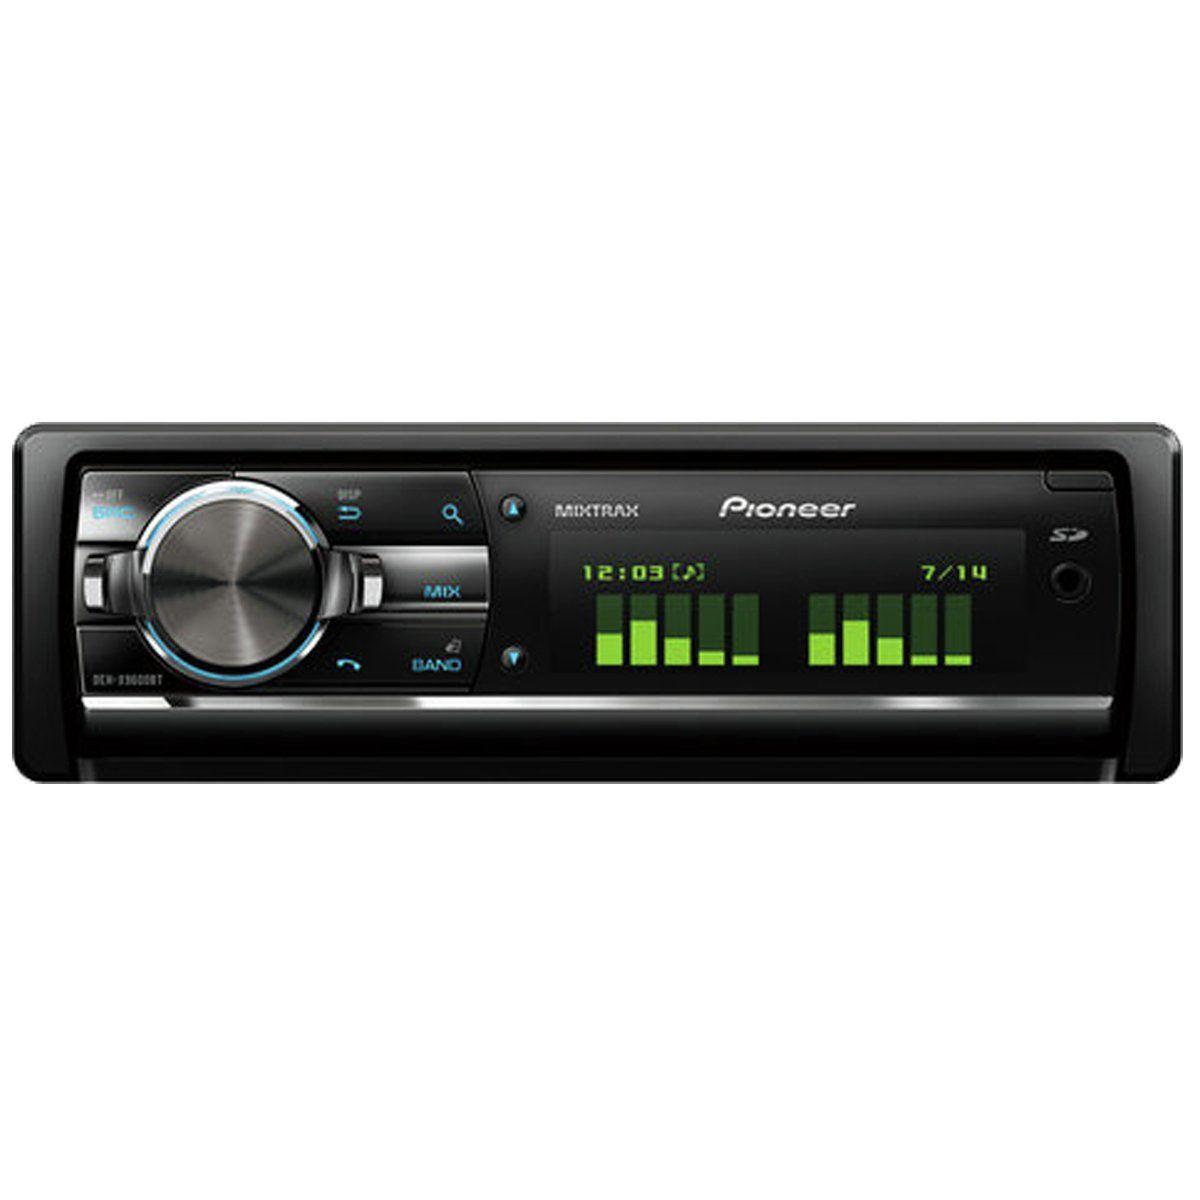 Buy Pioneer DEHX9600BT Car Stereo with Bluetooth In car